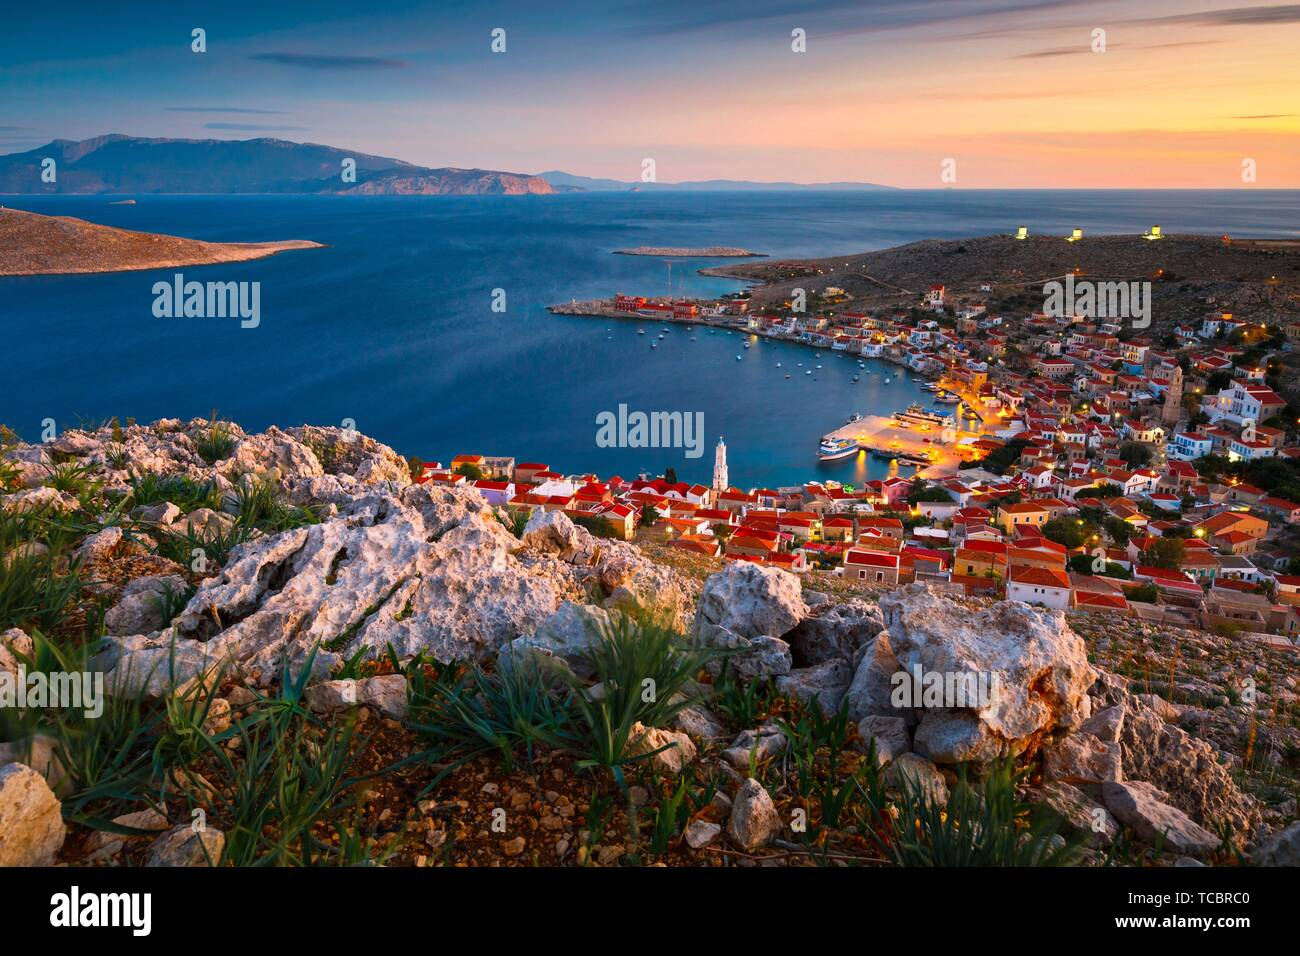 Village on Halki island in Dodecanese archipelago, Greece.. - Stock Image